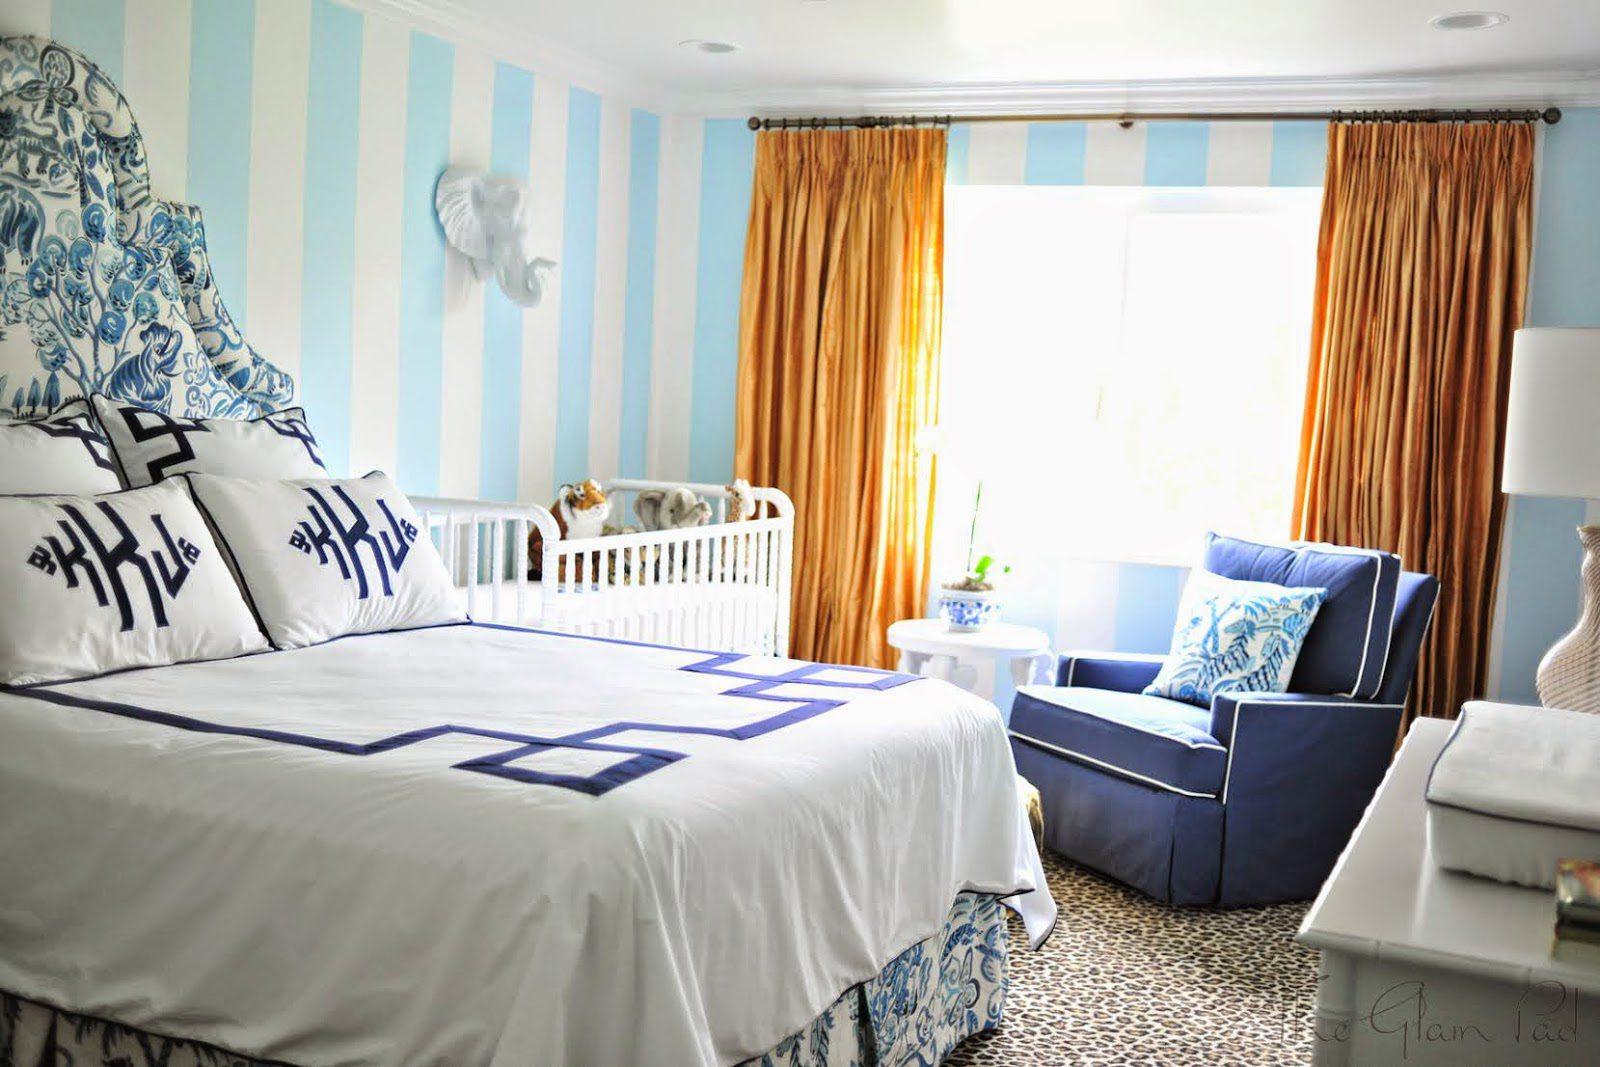 From Junk Room To Beautiful Bedroom The Big Reveal: One Room Challenge: Palm Beach Regency Nursery Reveal